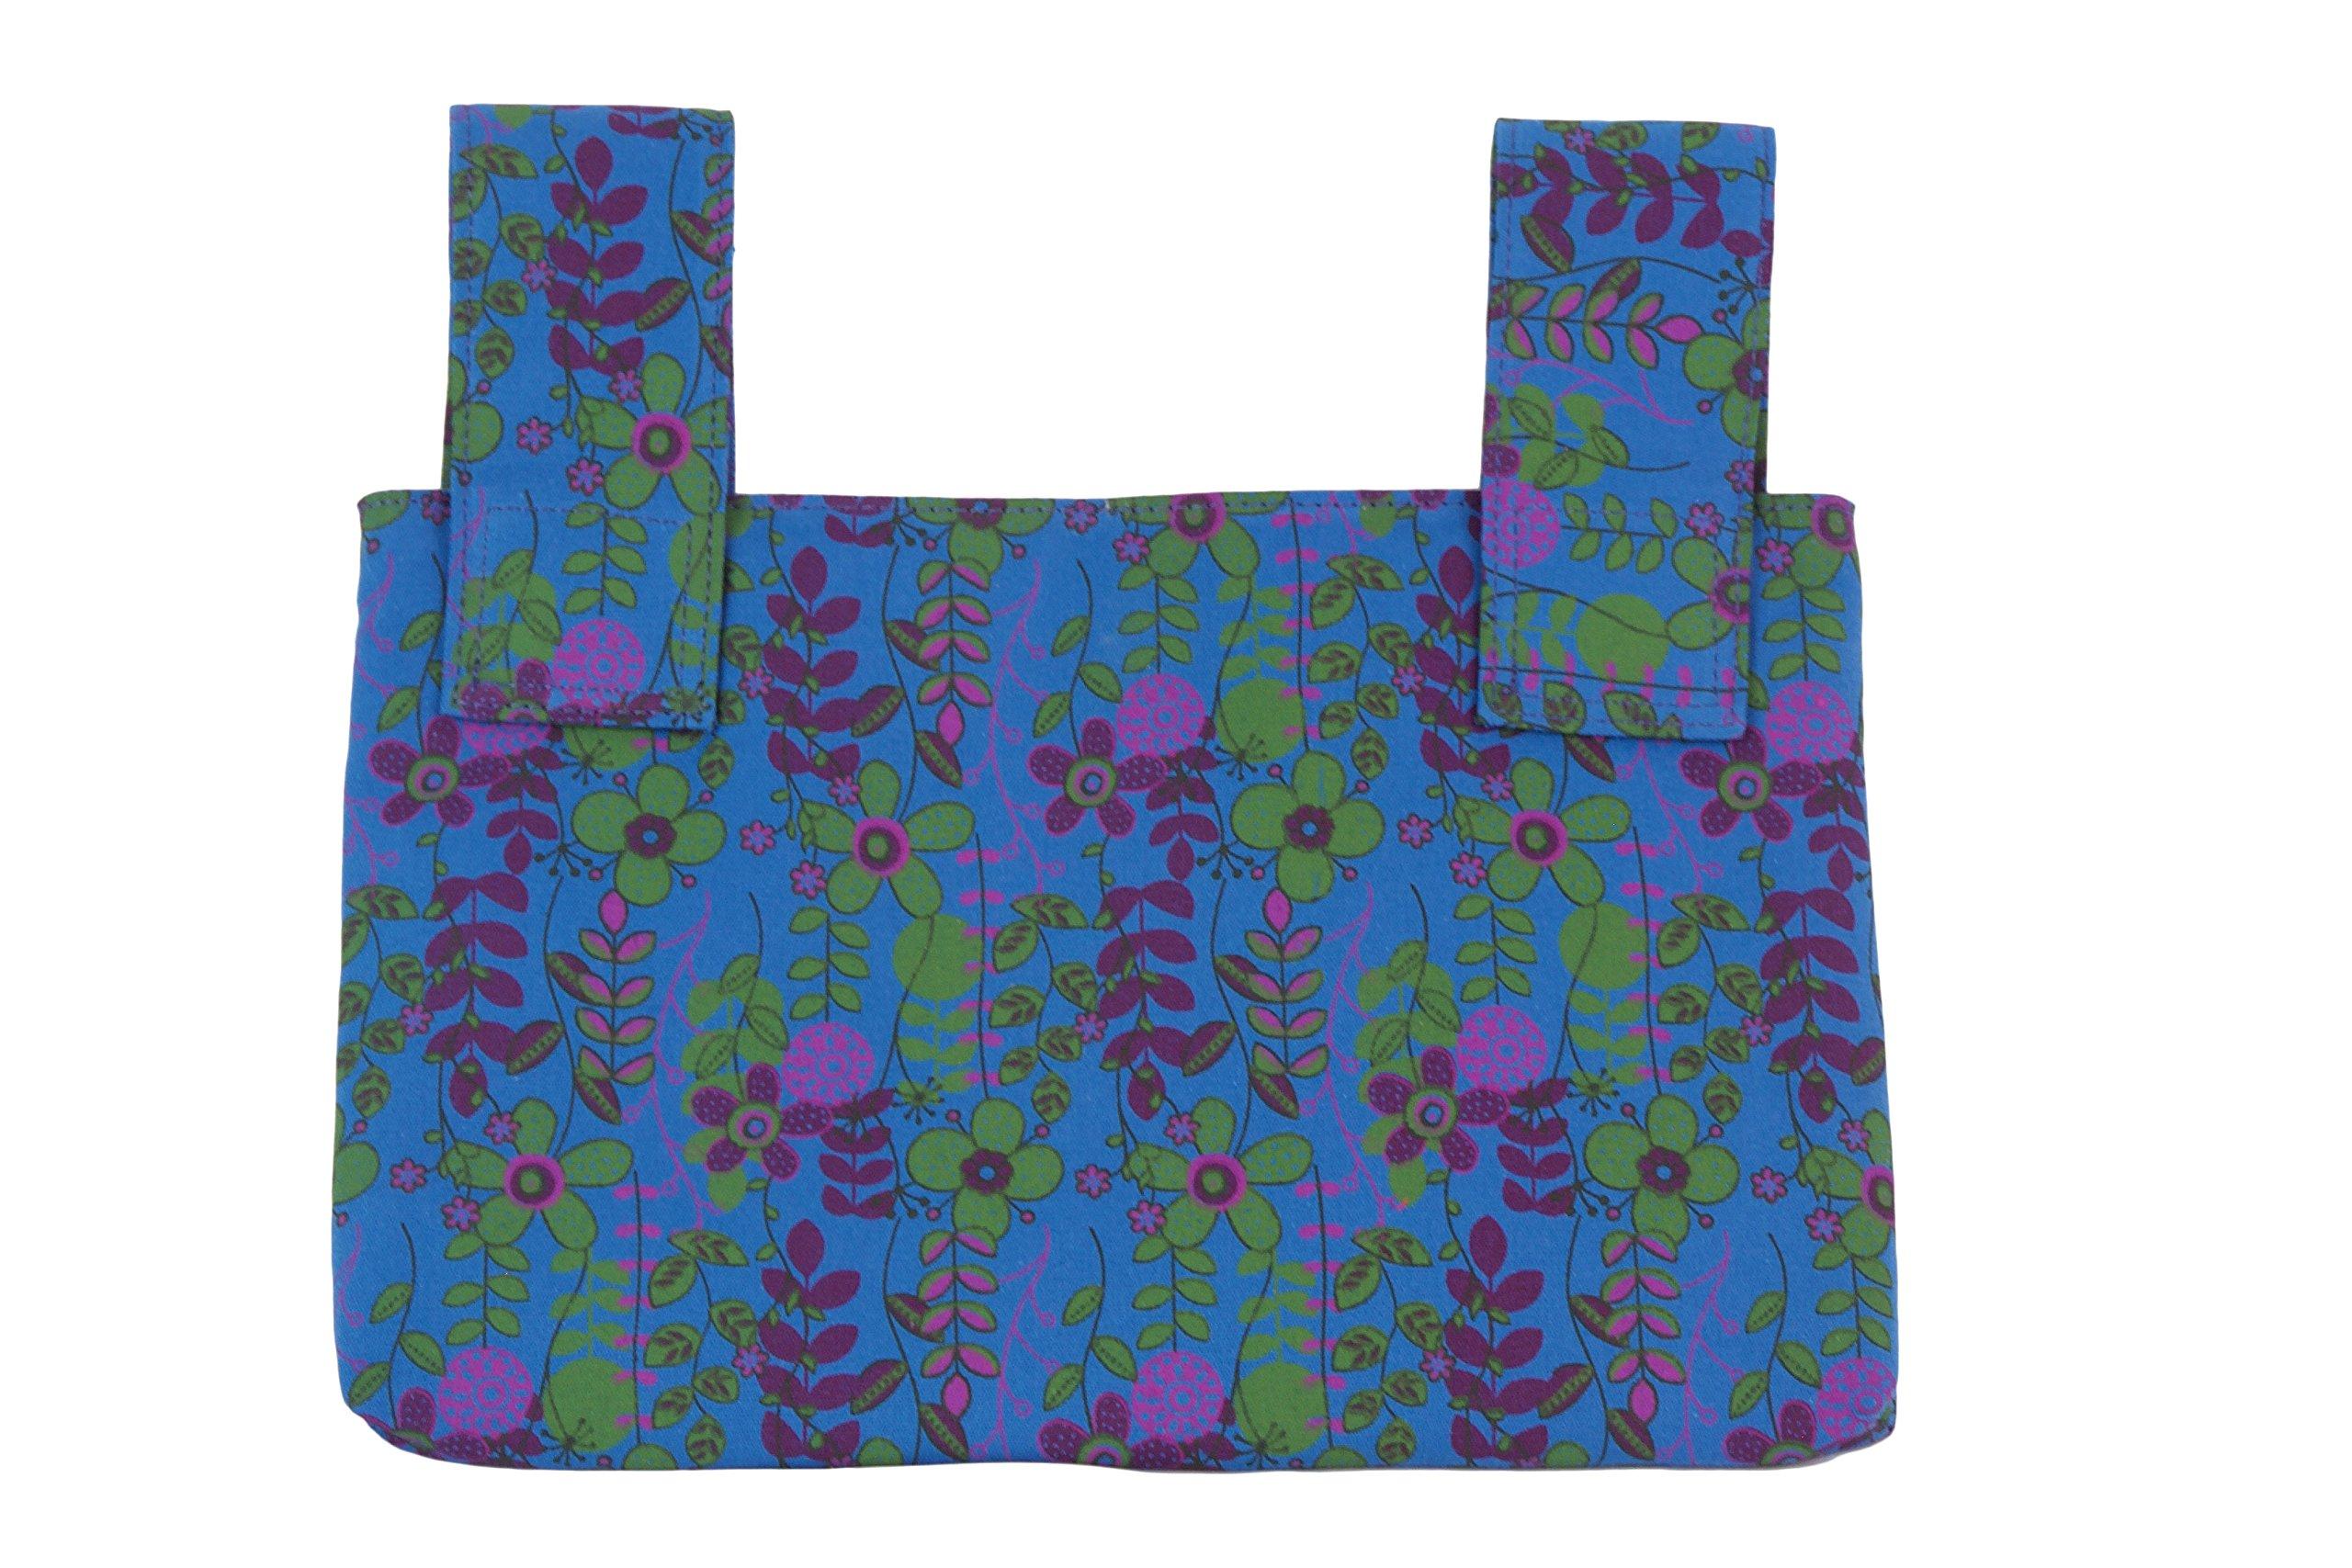 Qelse Designer Walker Bag 3-Pocket Tote Organizer Pouch BLUE Accessories for Beautiful Mobility